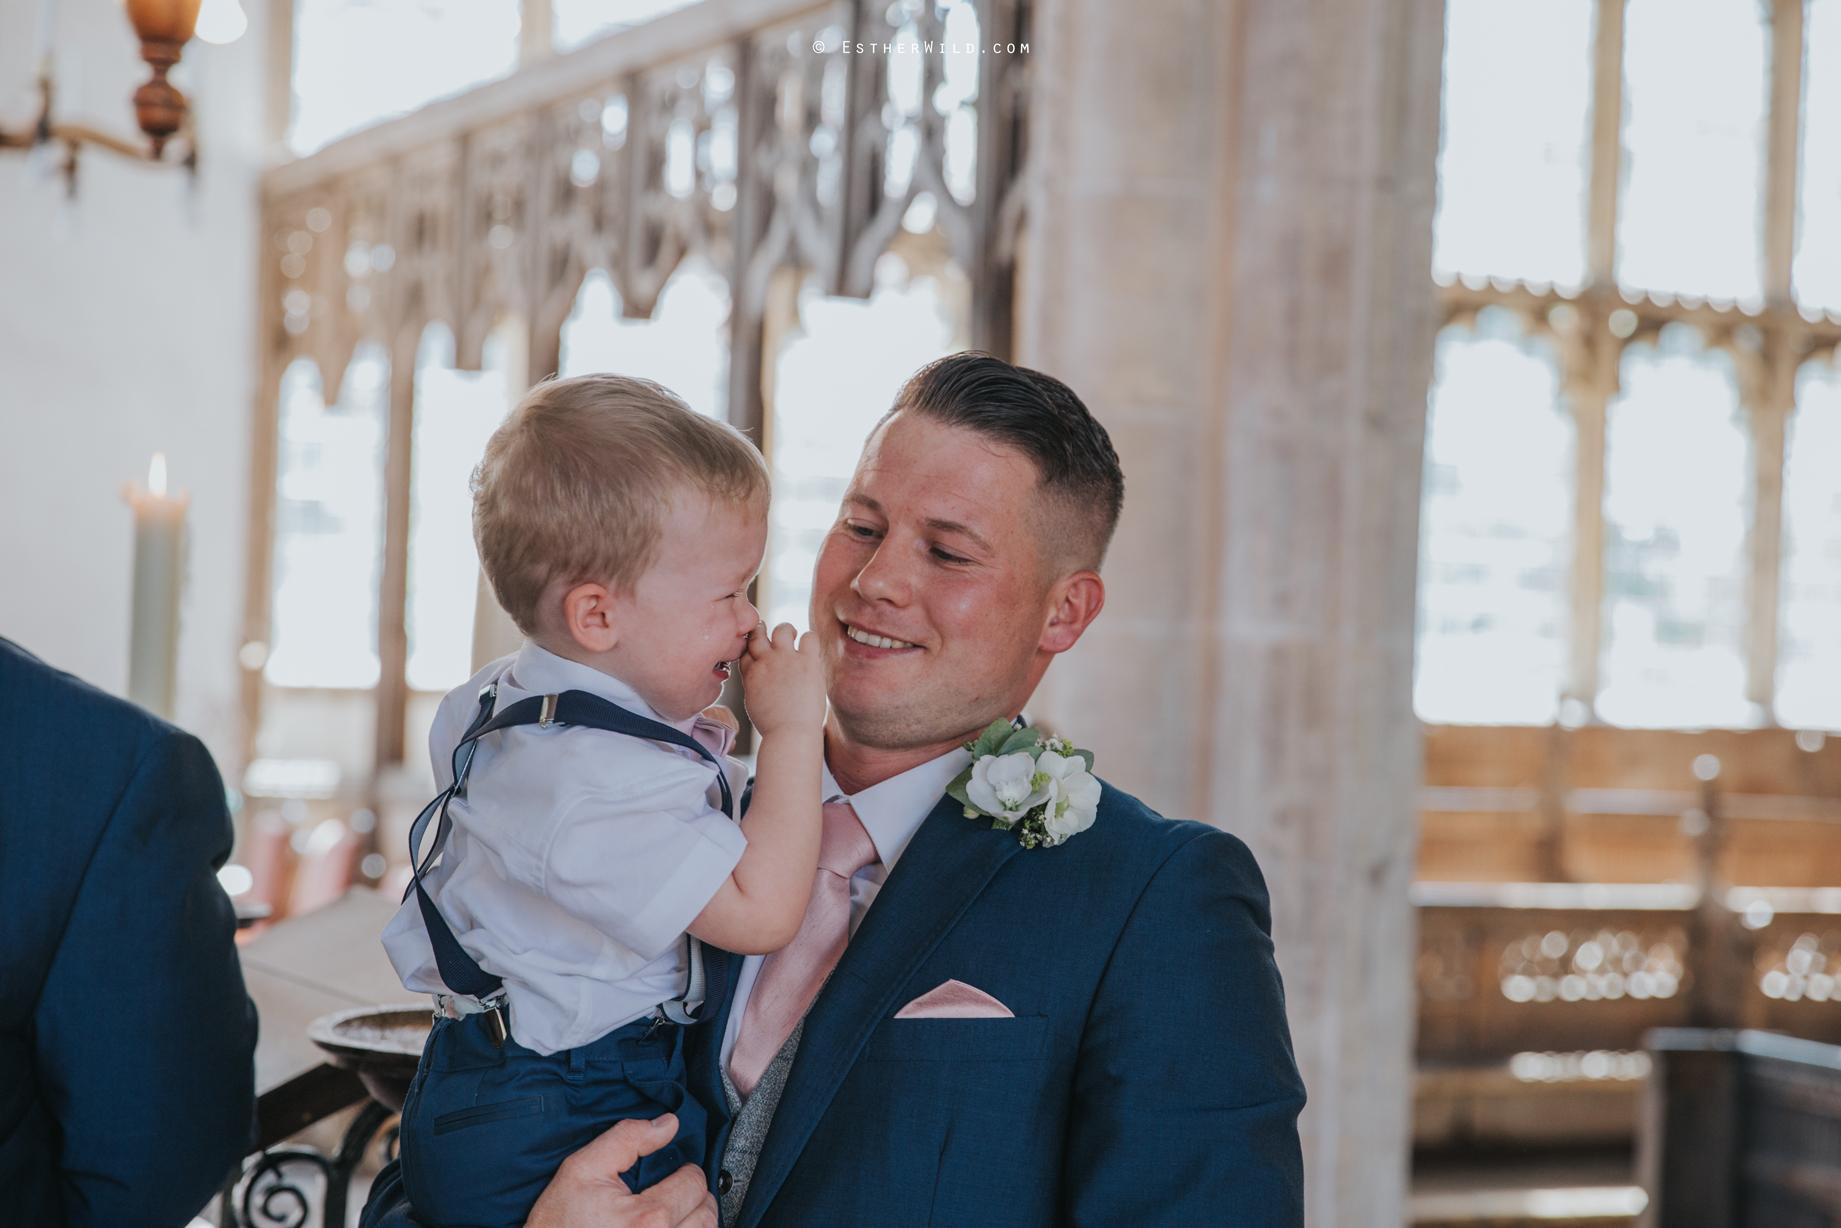 IMG_0387Walpole_St_Andrew_Church_Norfolk_Wedding_Copyright_Esther_Wild_Photographer_.jpg